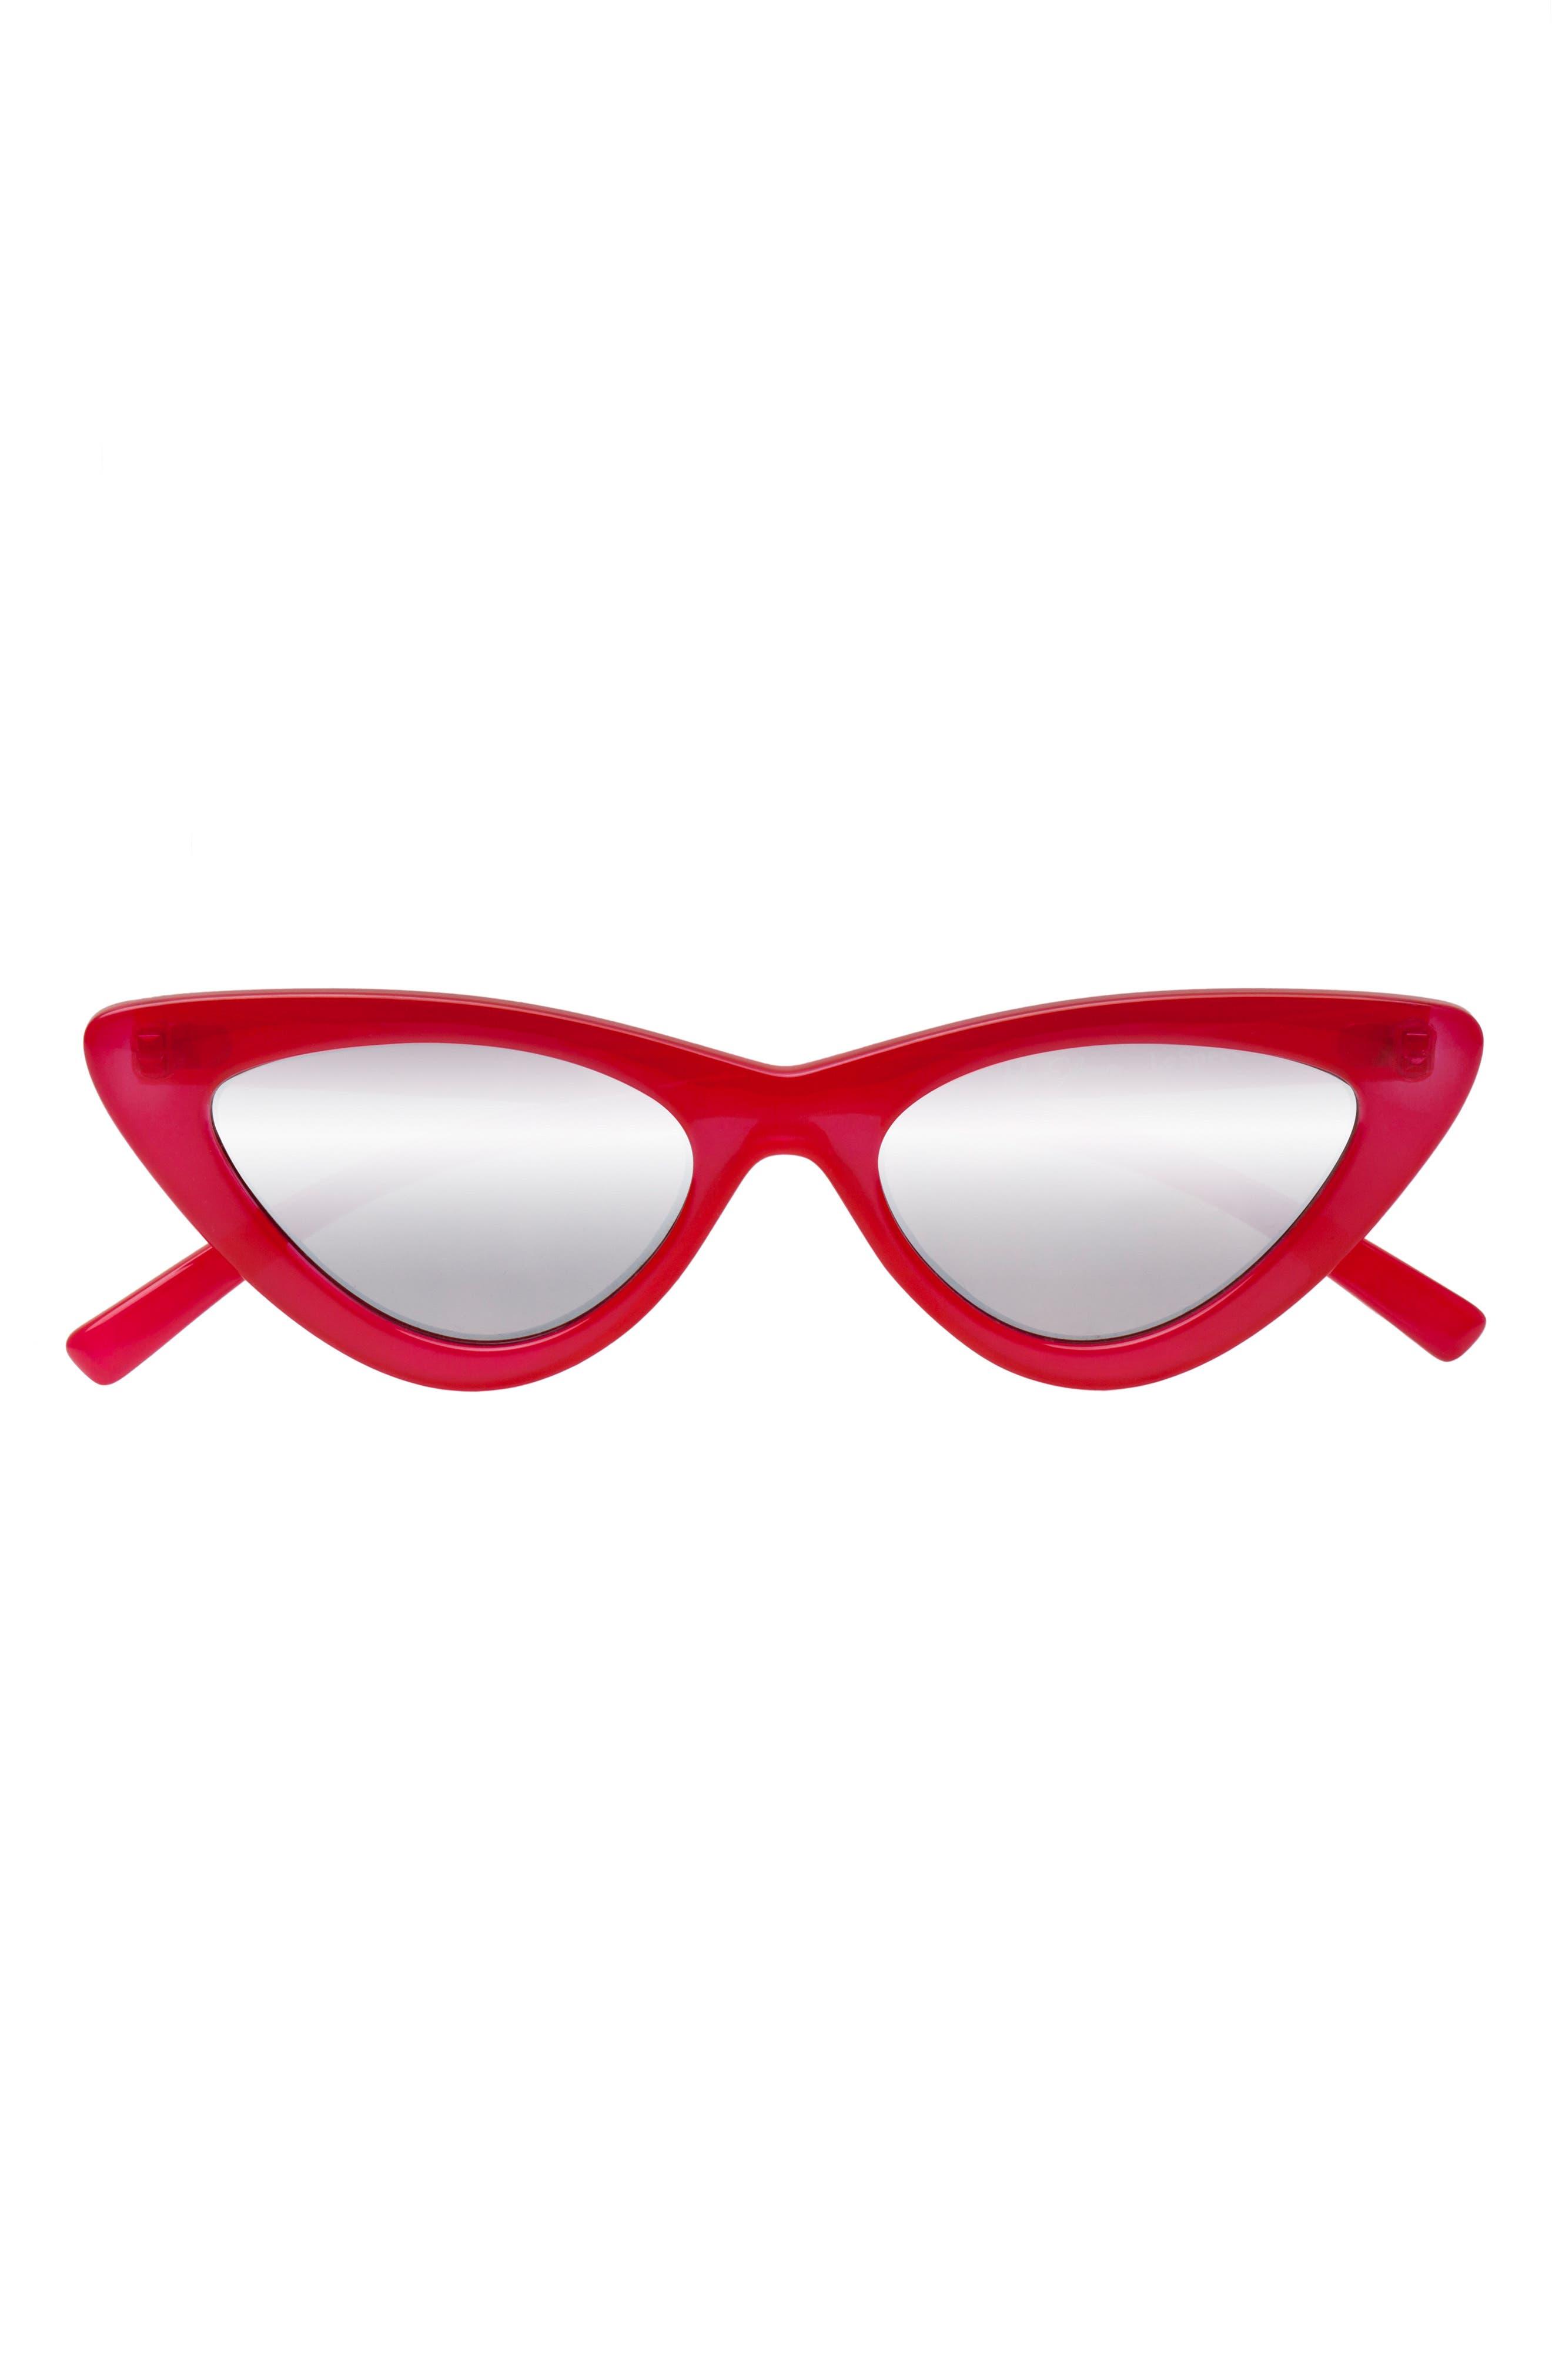 Main Image - Adam Selman x Le Specs Luxe Last Lolita 49mm Cat Eye Sunglasses